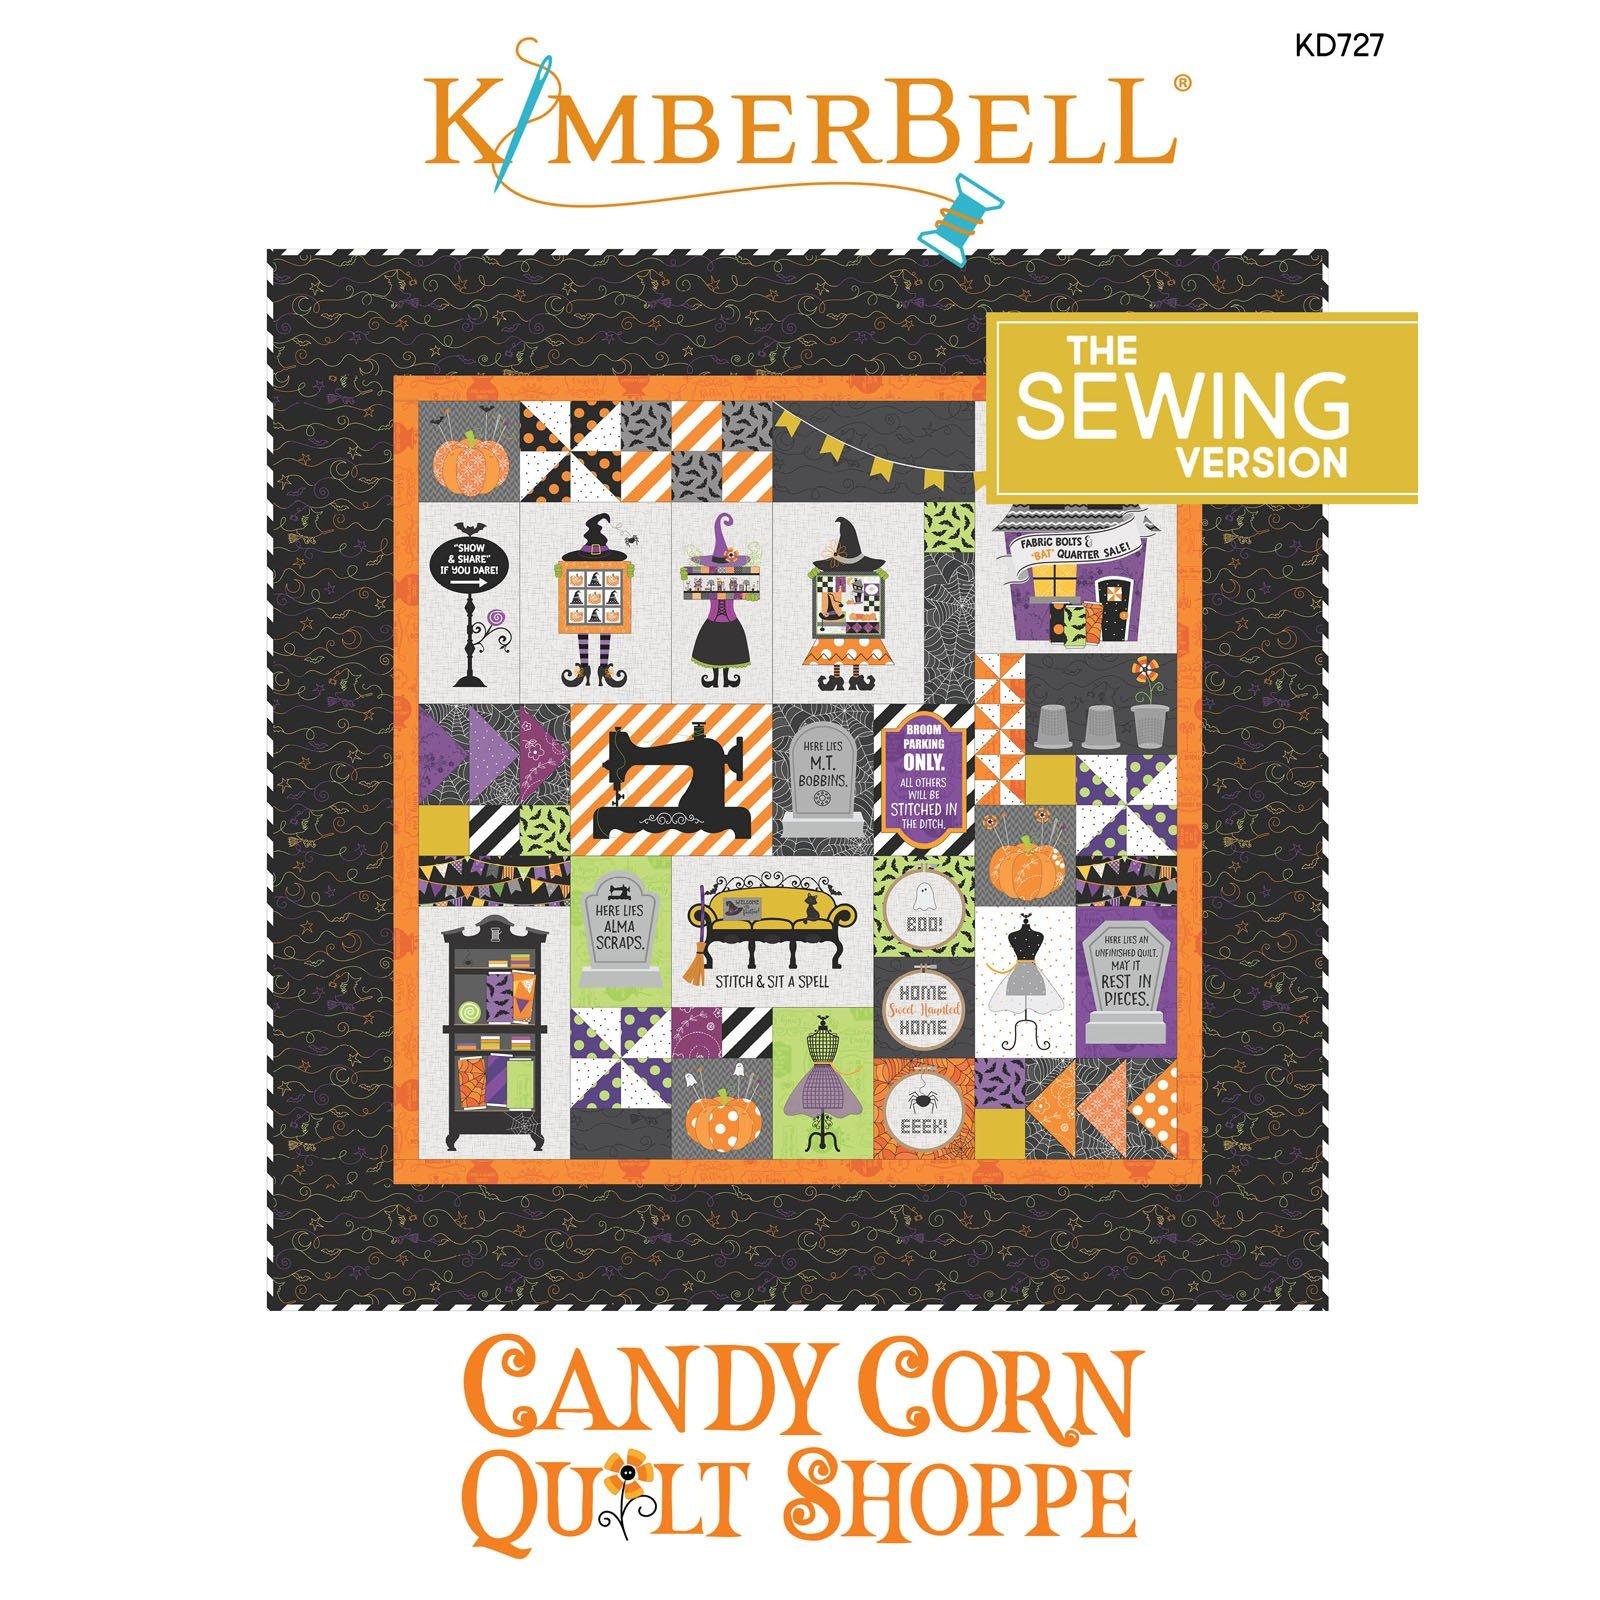 Candy Corn Quilt Shoppe Book